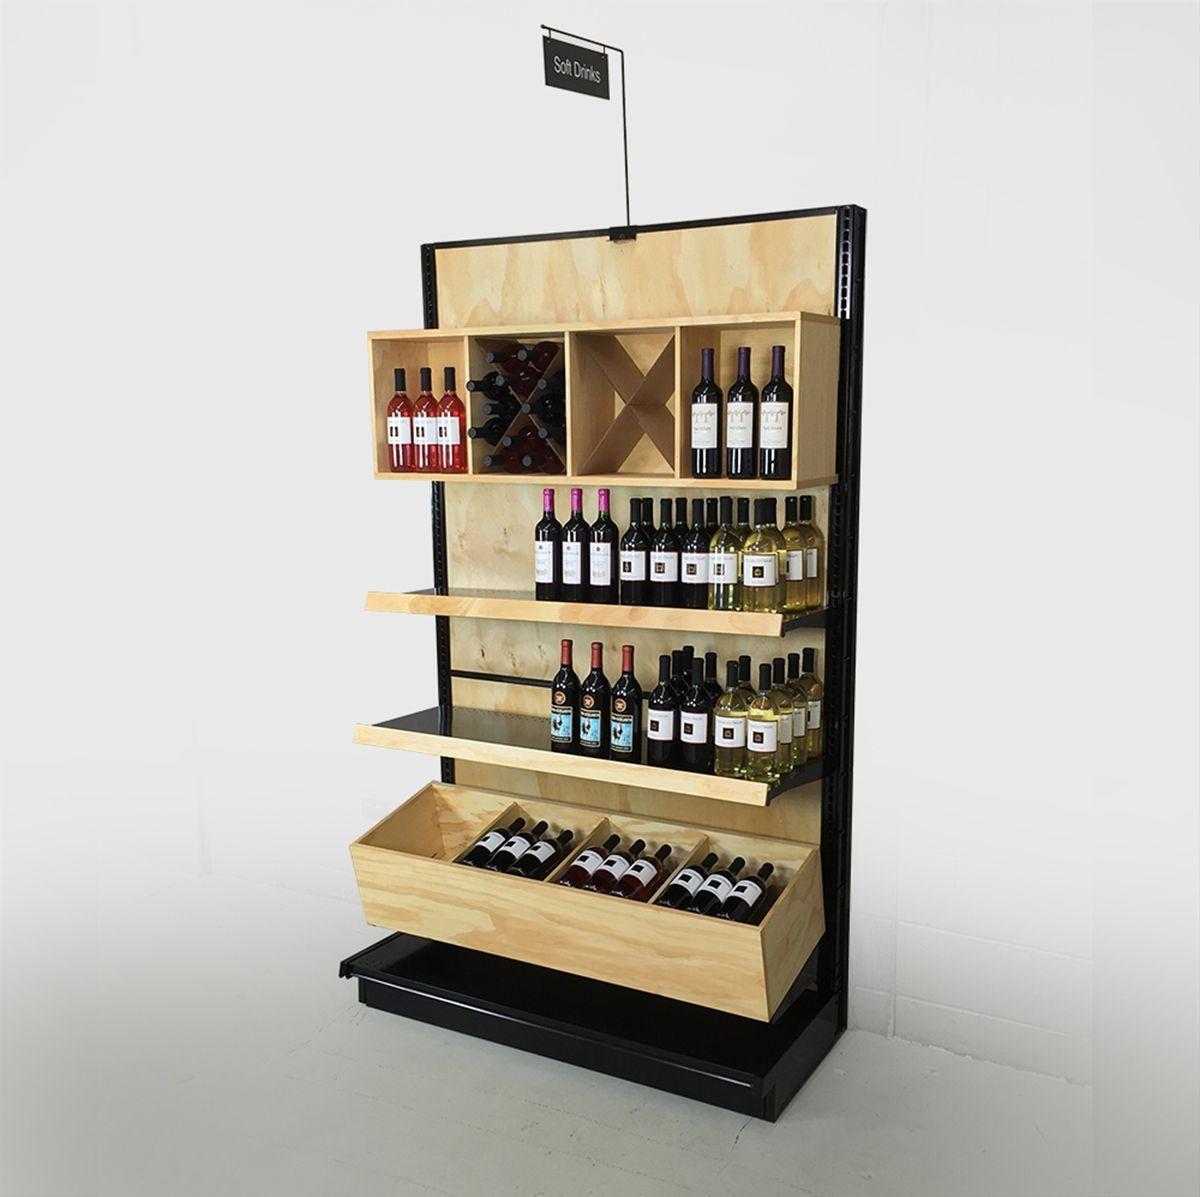 Liquor Store Display Shelving